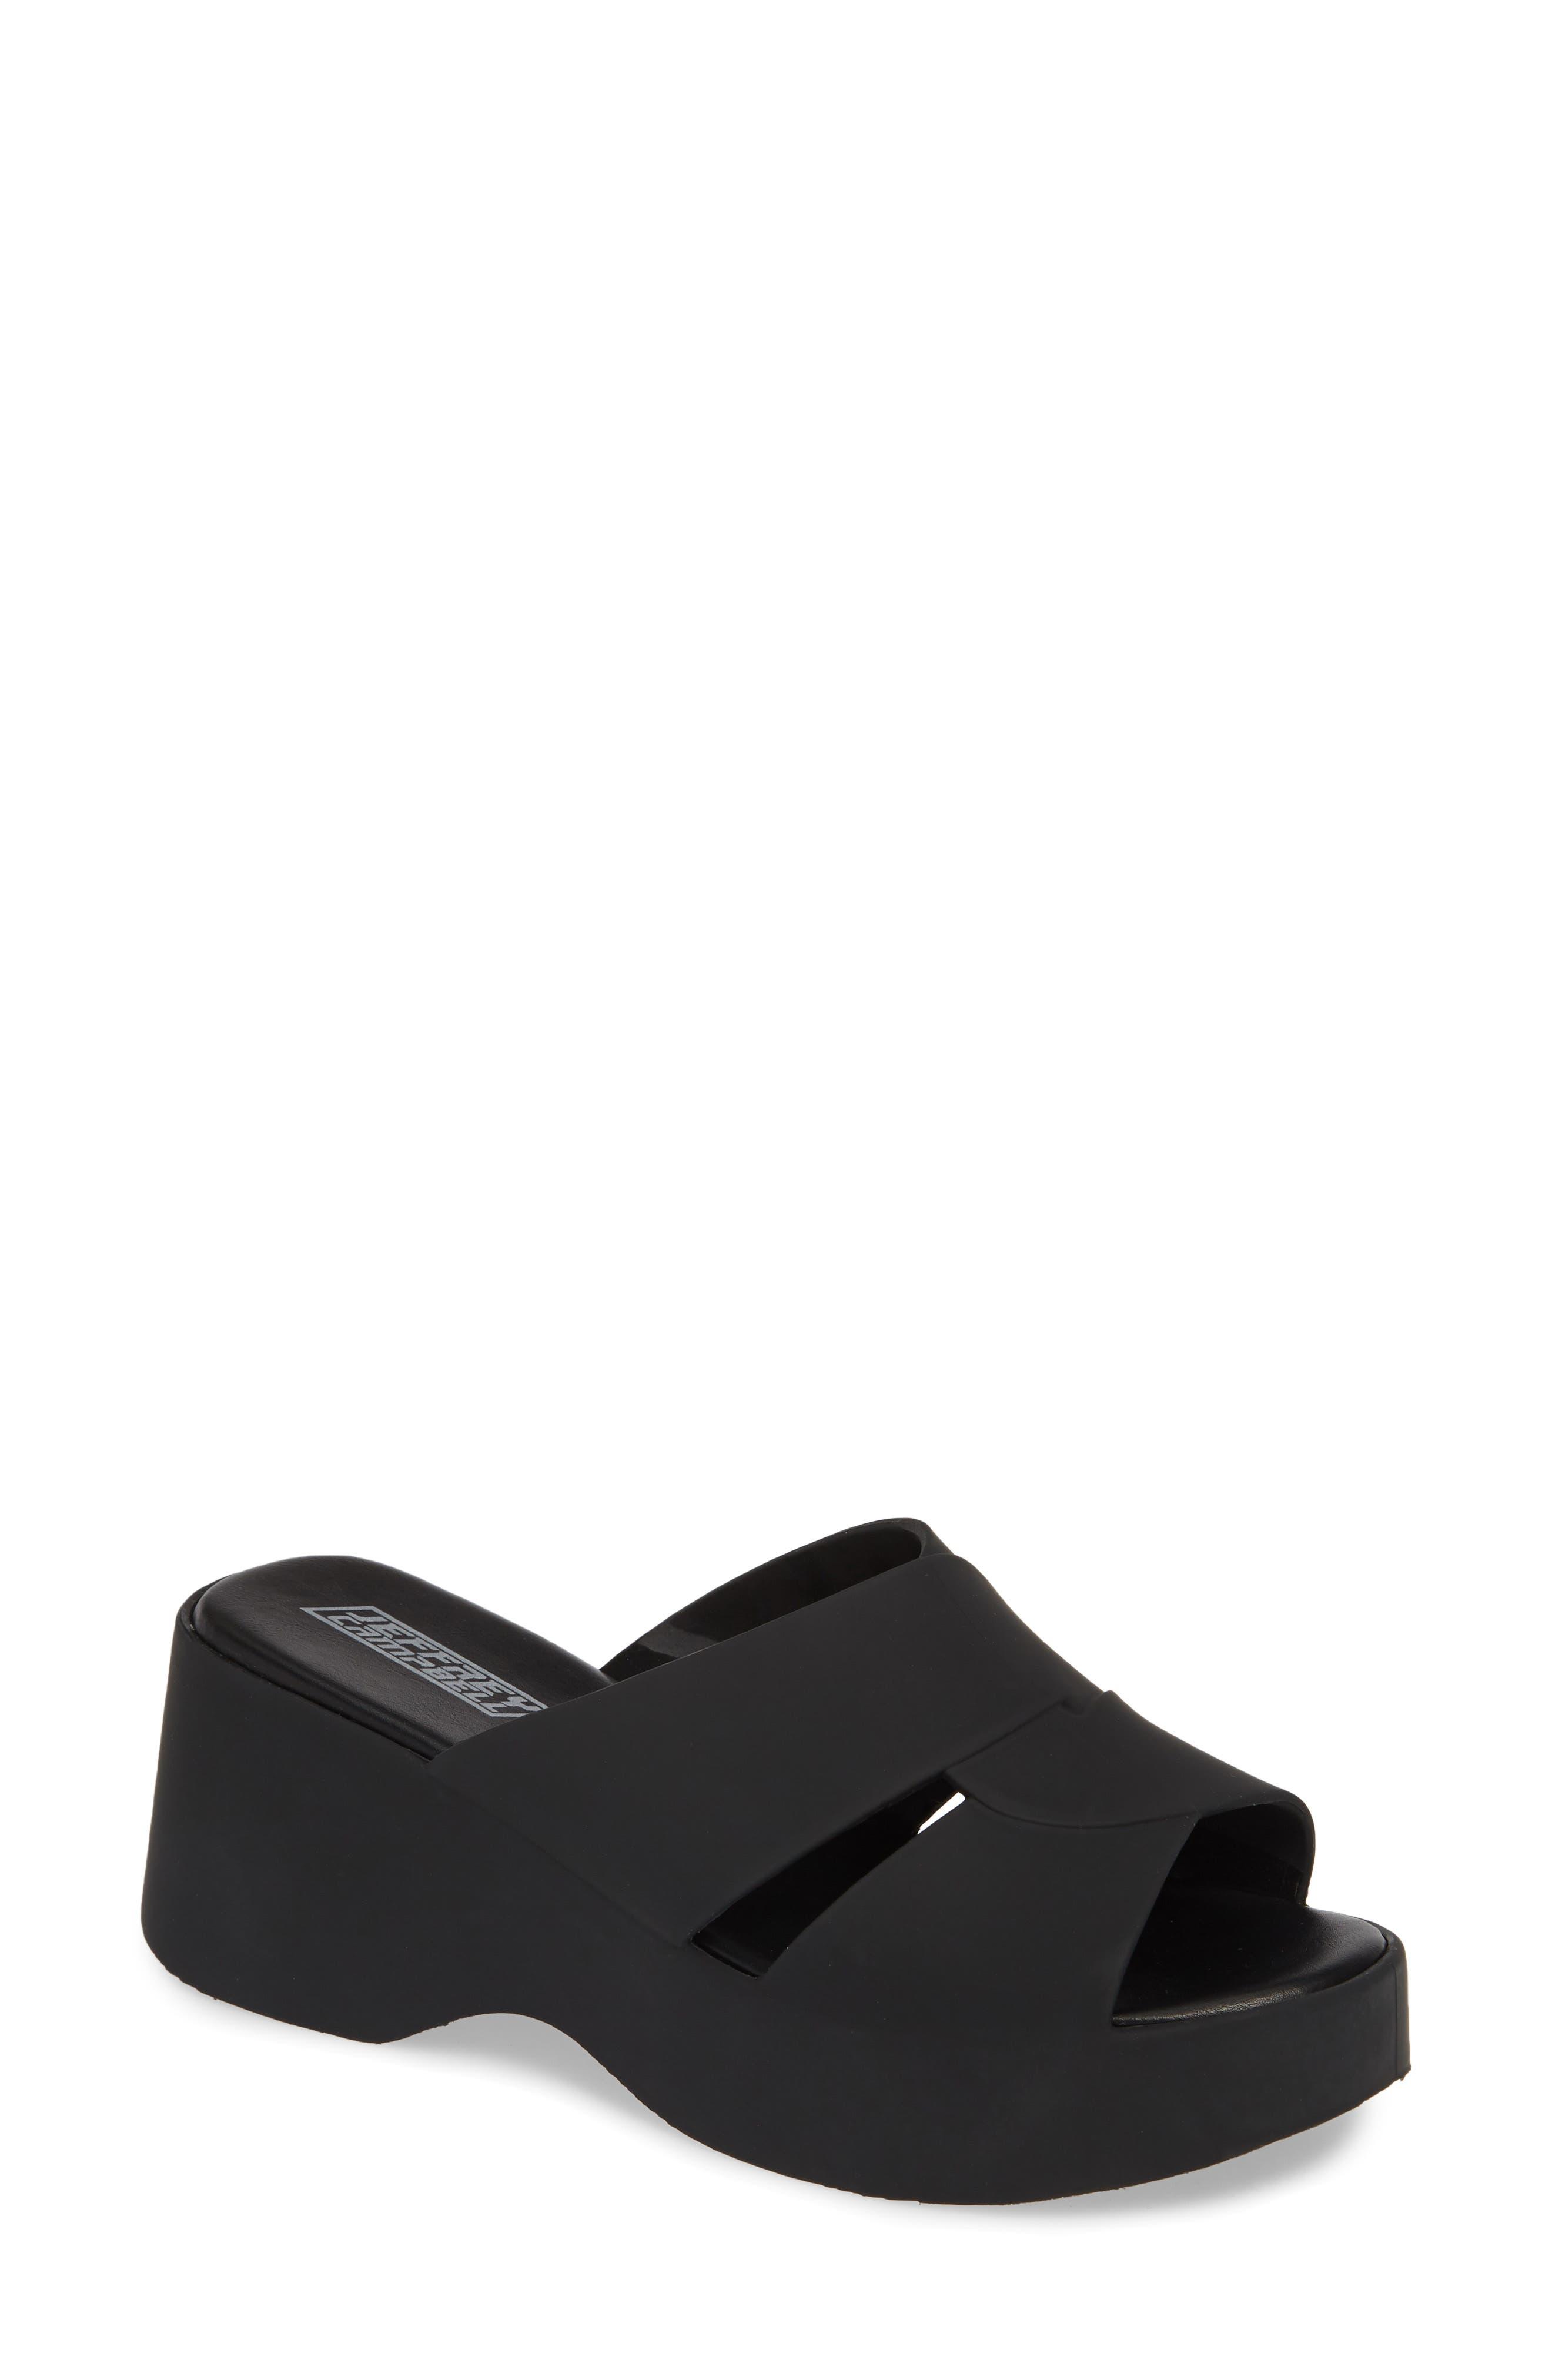 JEFFREY CAMPBELL Jelli Slide Sandal, Main, color, BLACK MATTE